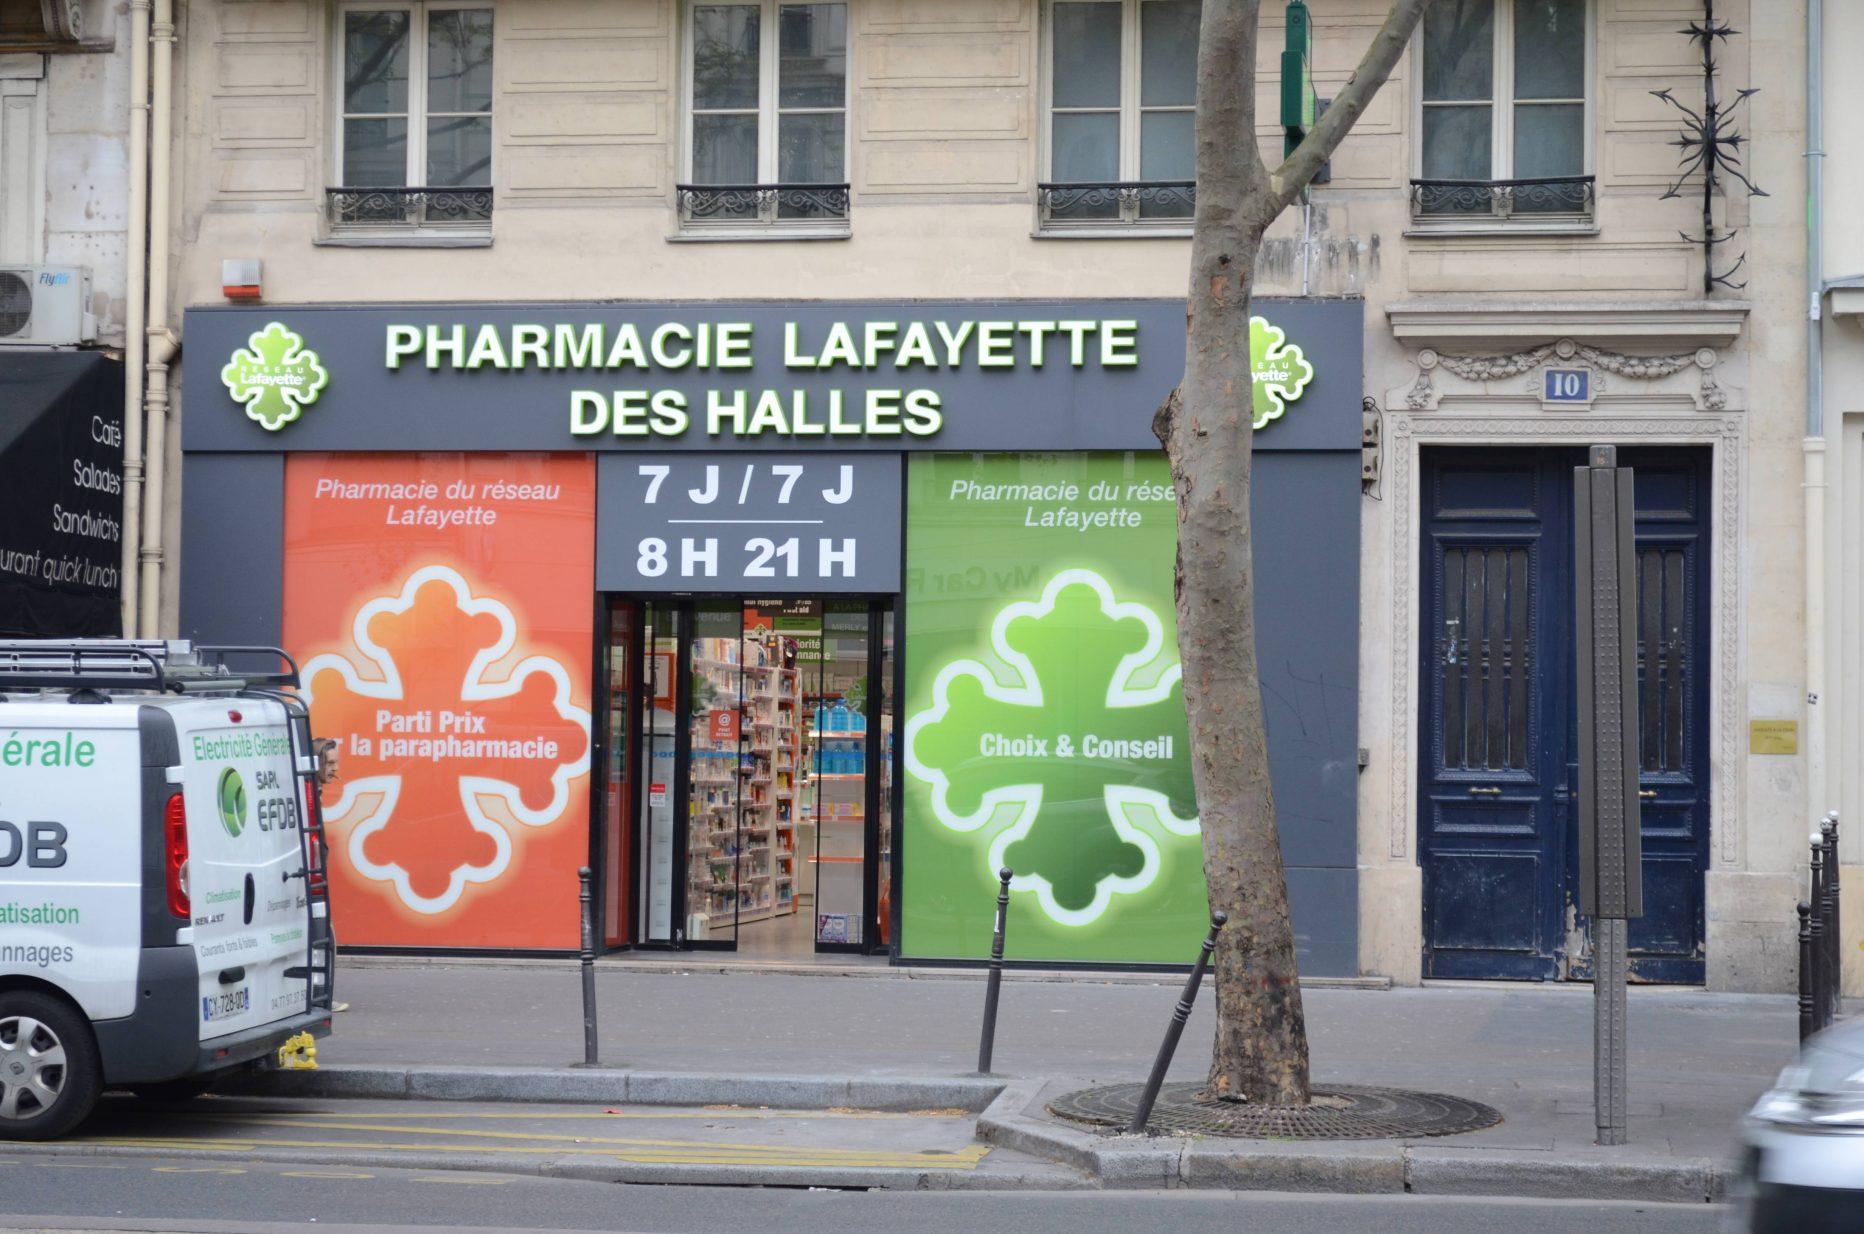 Pharmacie des Halles